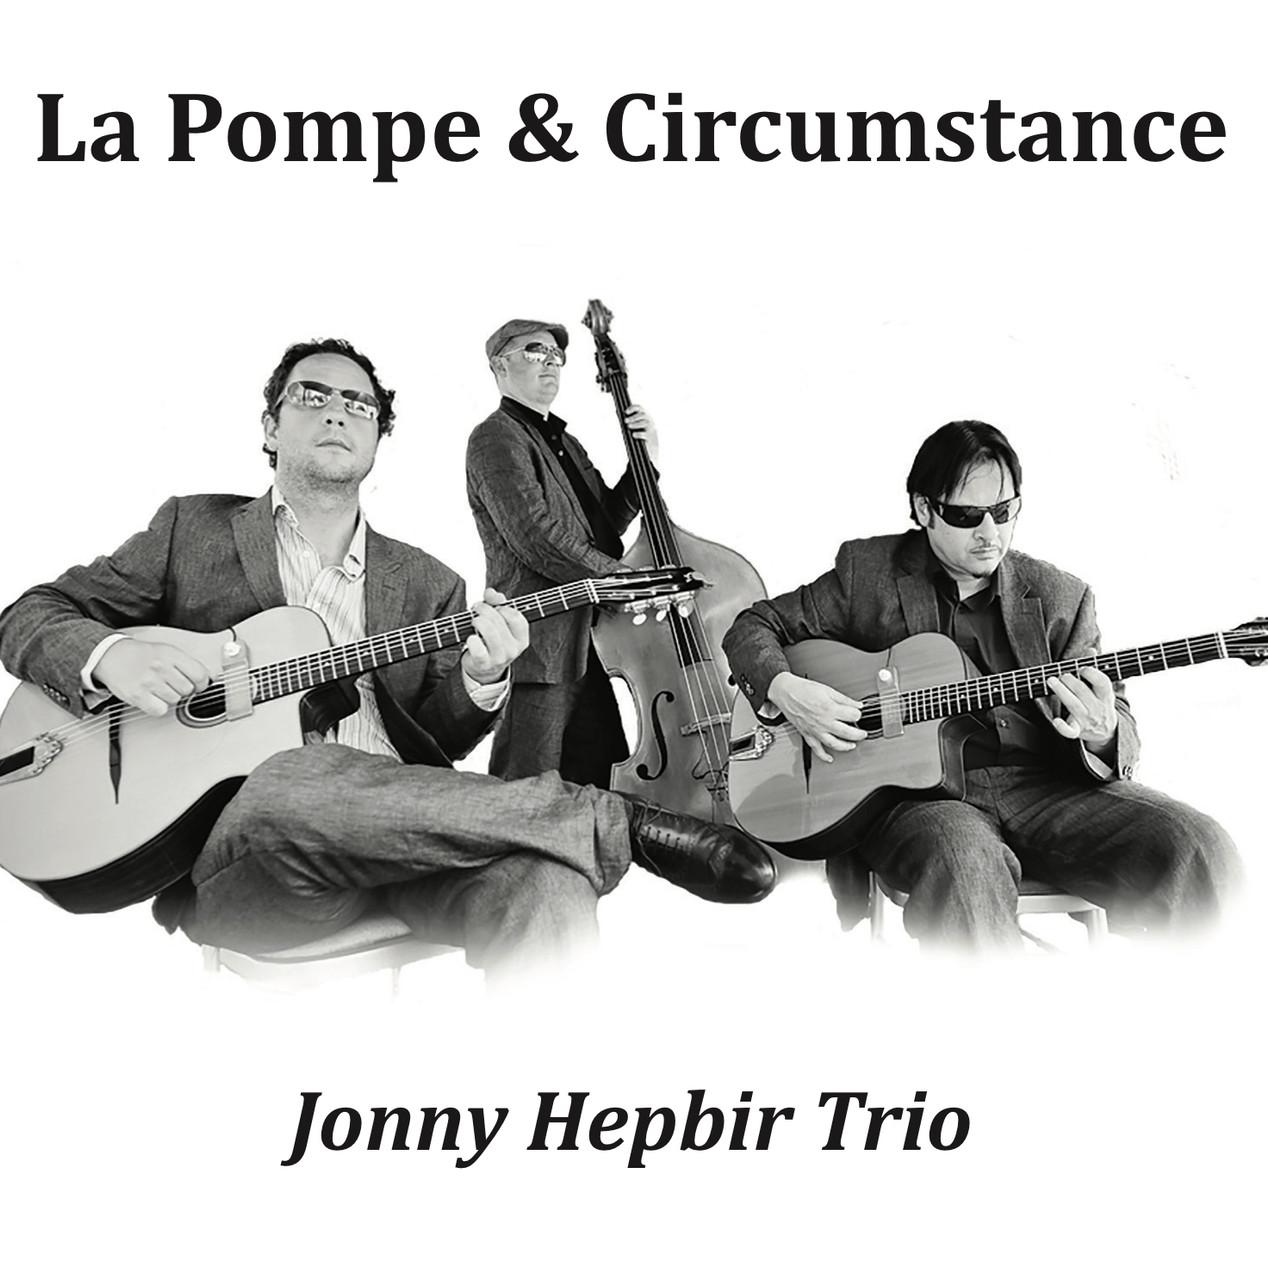 Jonny Hepbir Trio 'La Pompe & Circumstance'